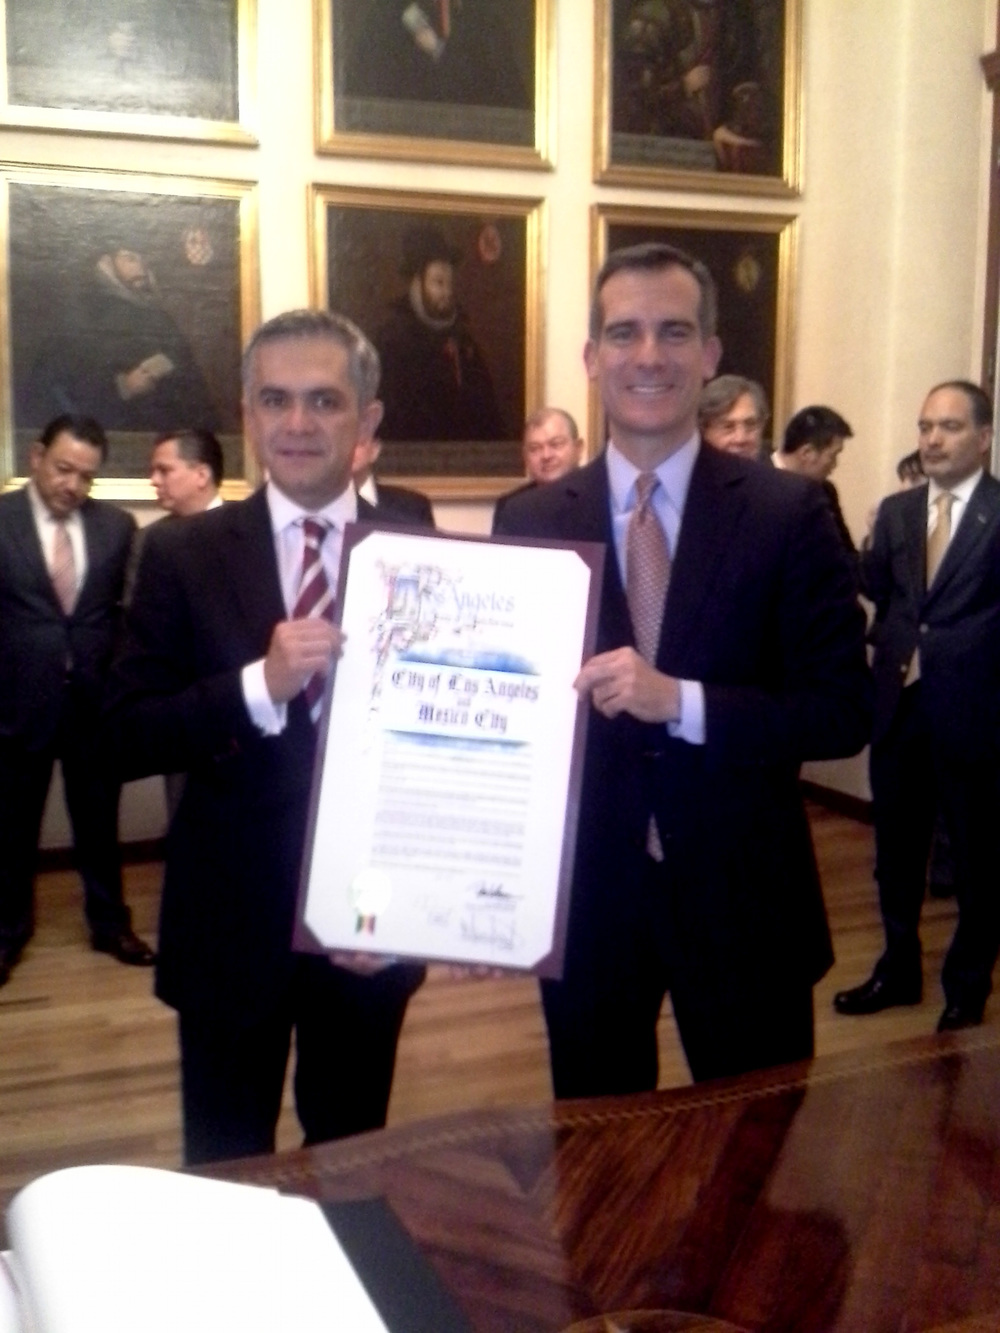 Mayor of Mexico City,Miguel Ángel Mancera and Mayor of Los Angeles, Eric Garcetti.